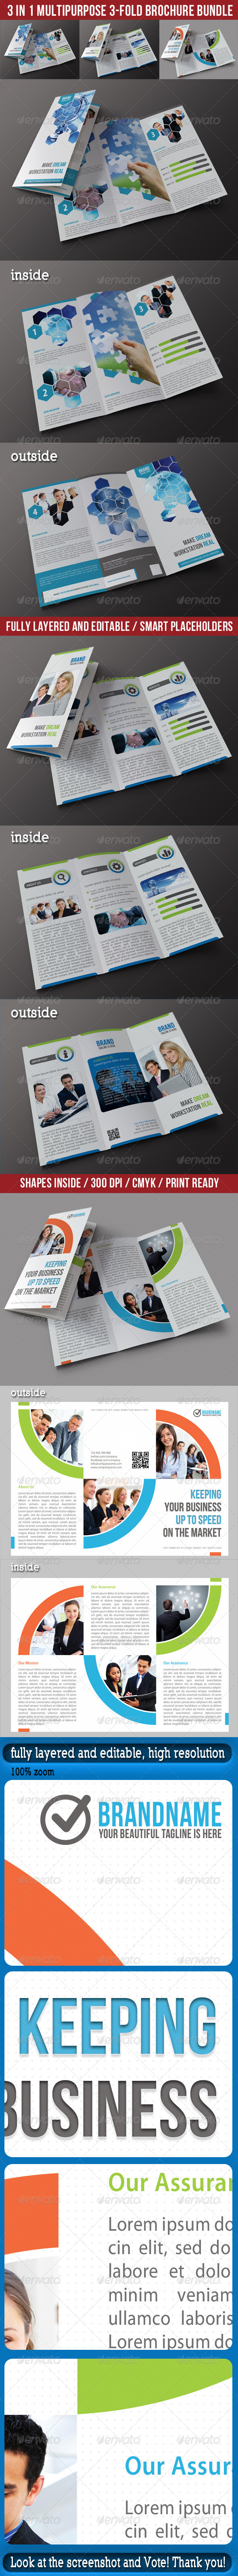 3 in 1 Corporate 3-Fold Brochure Bundle 01 - Corporate Brochures